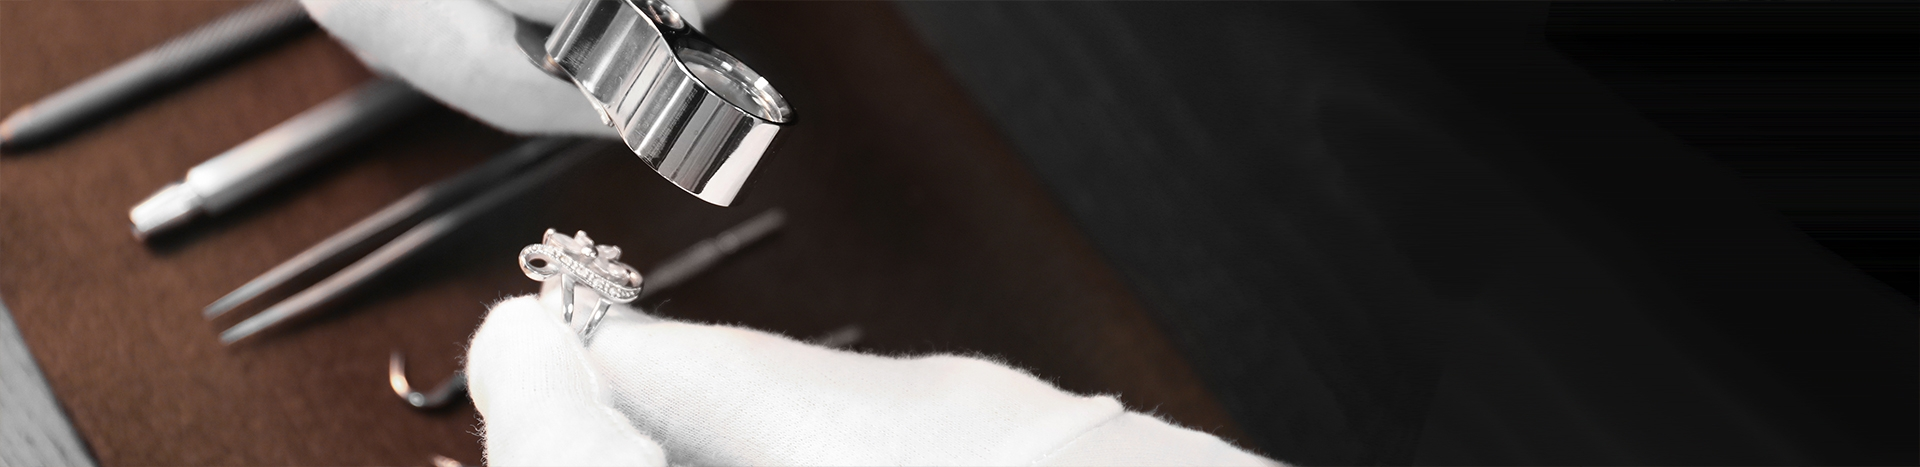 Jewelry Appraisal Cleveland